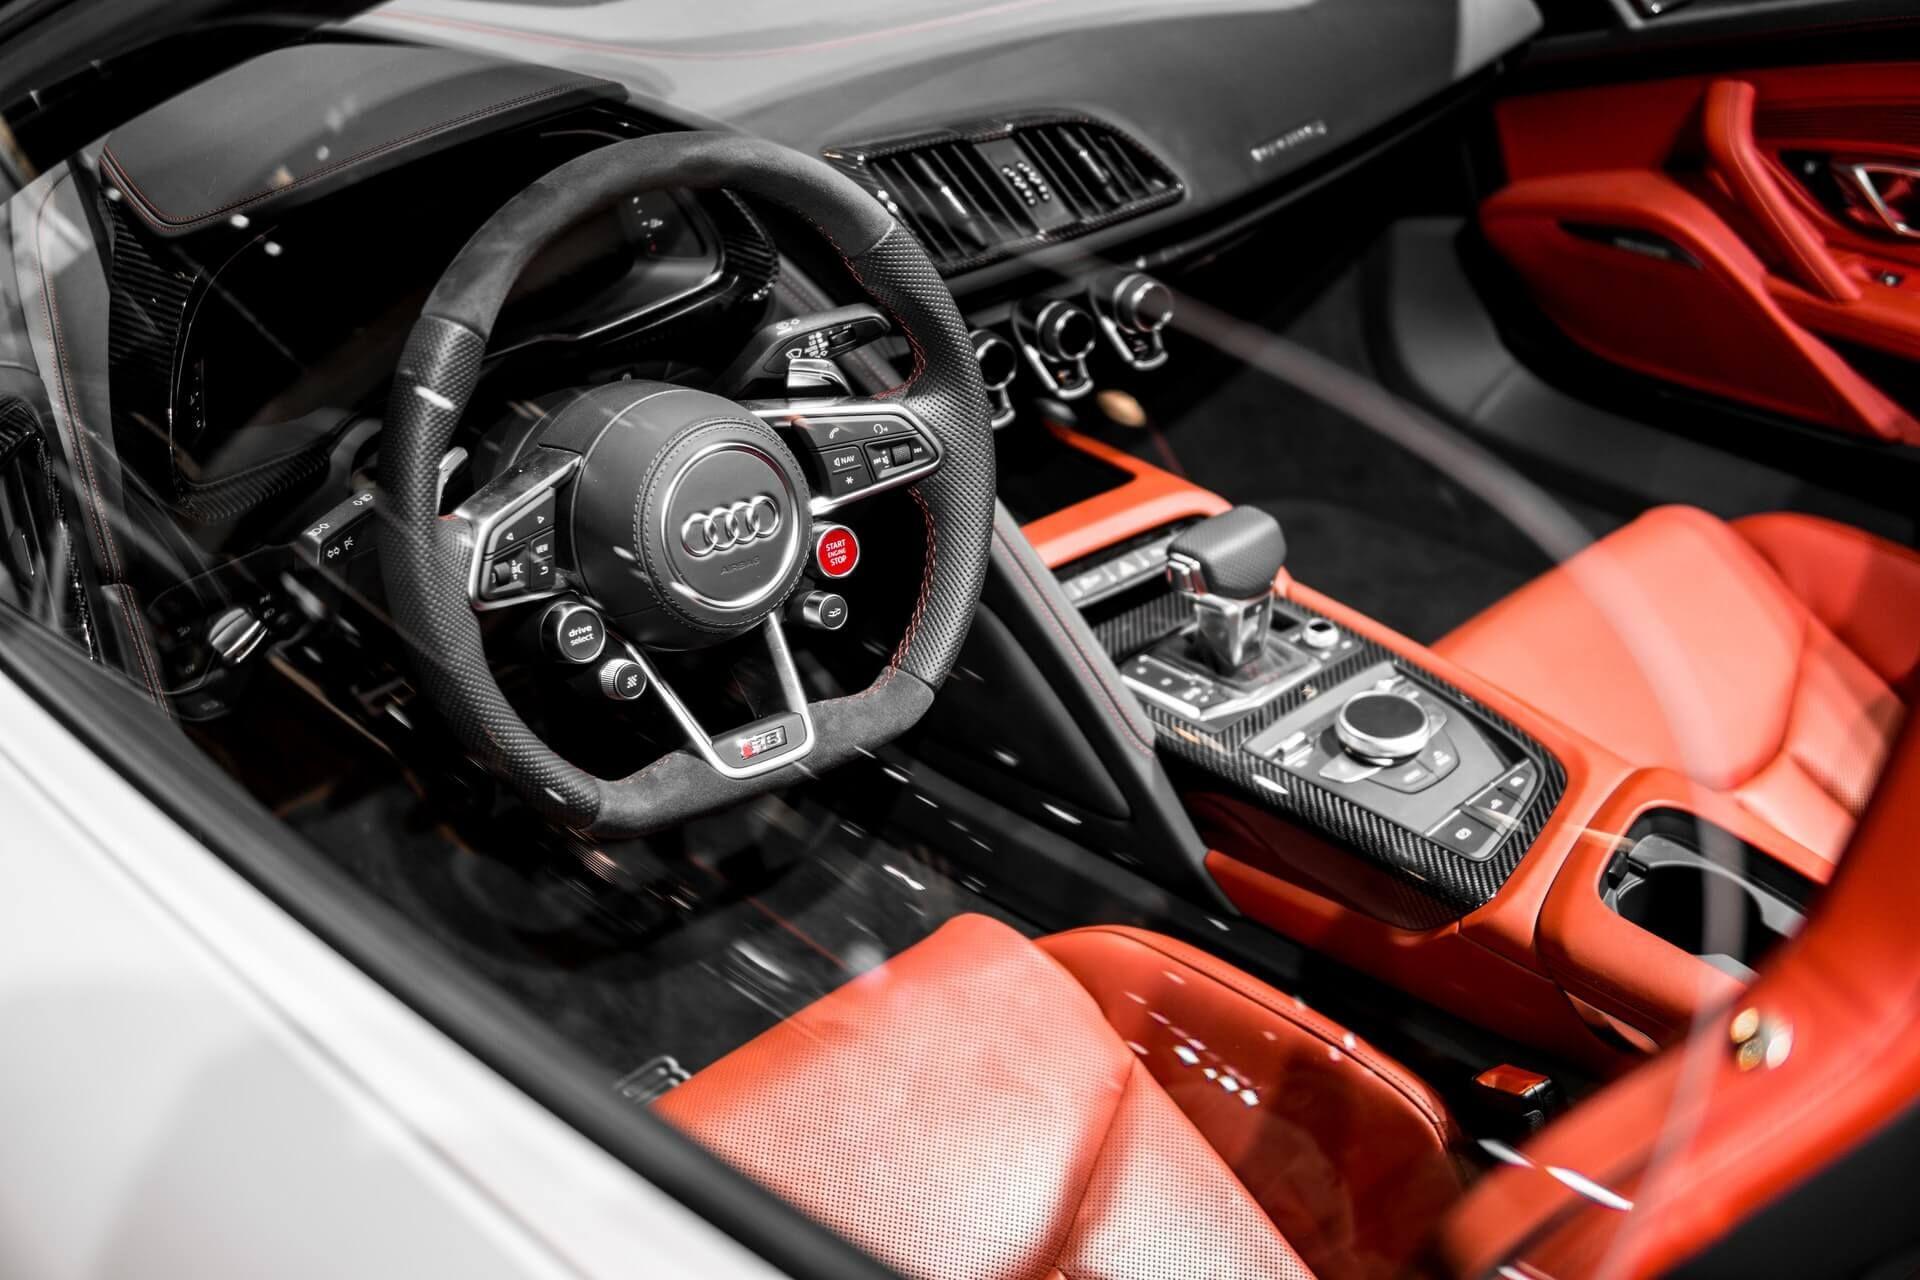 /how-to-build-an-obd2-reader-for-car-diagnostics-9z3533q4 feature image